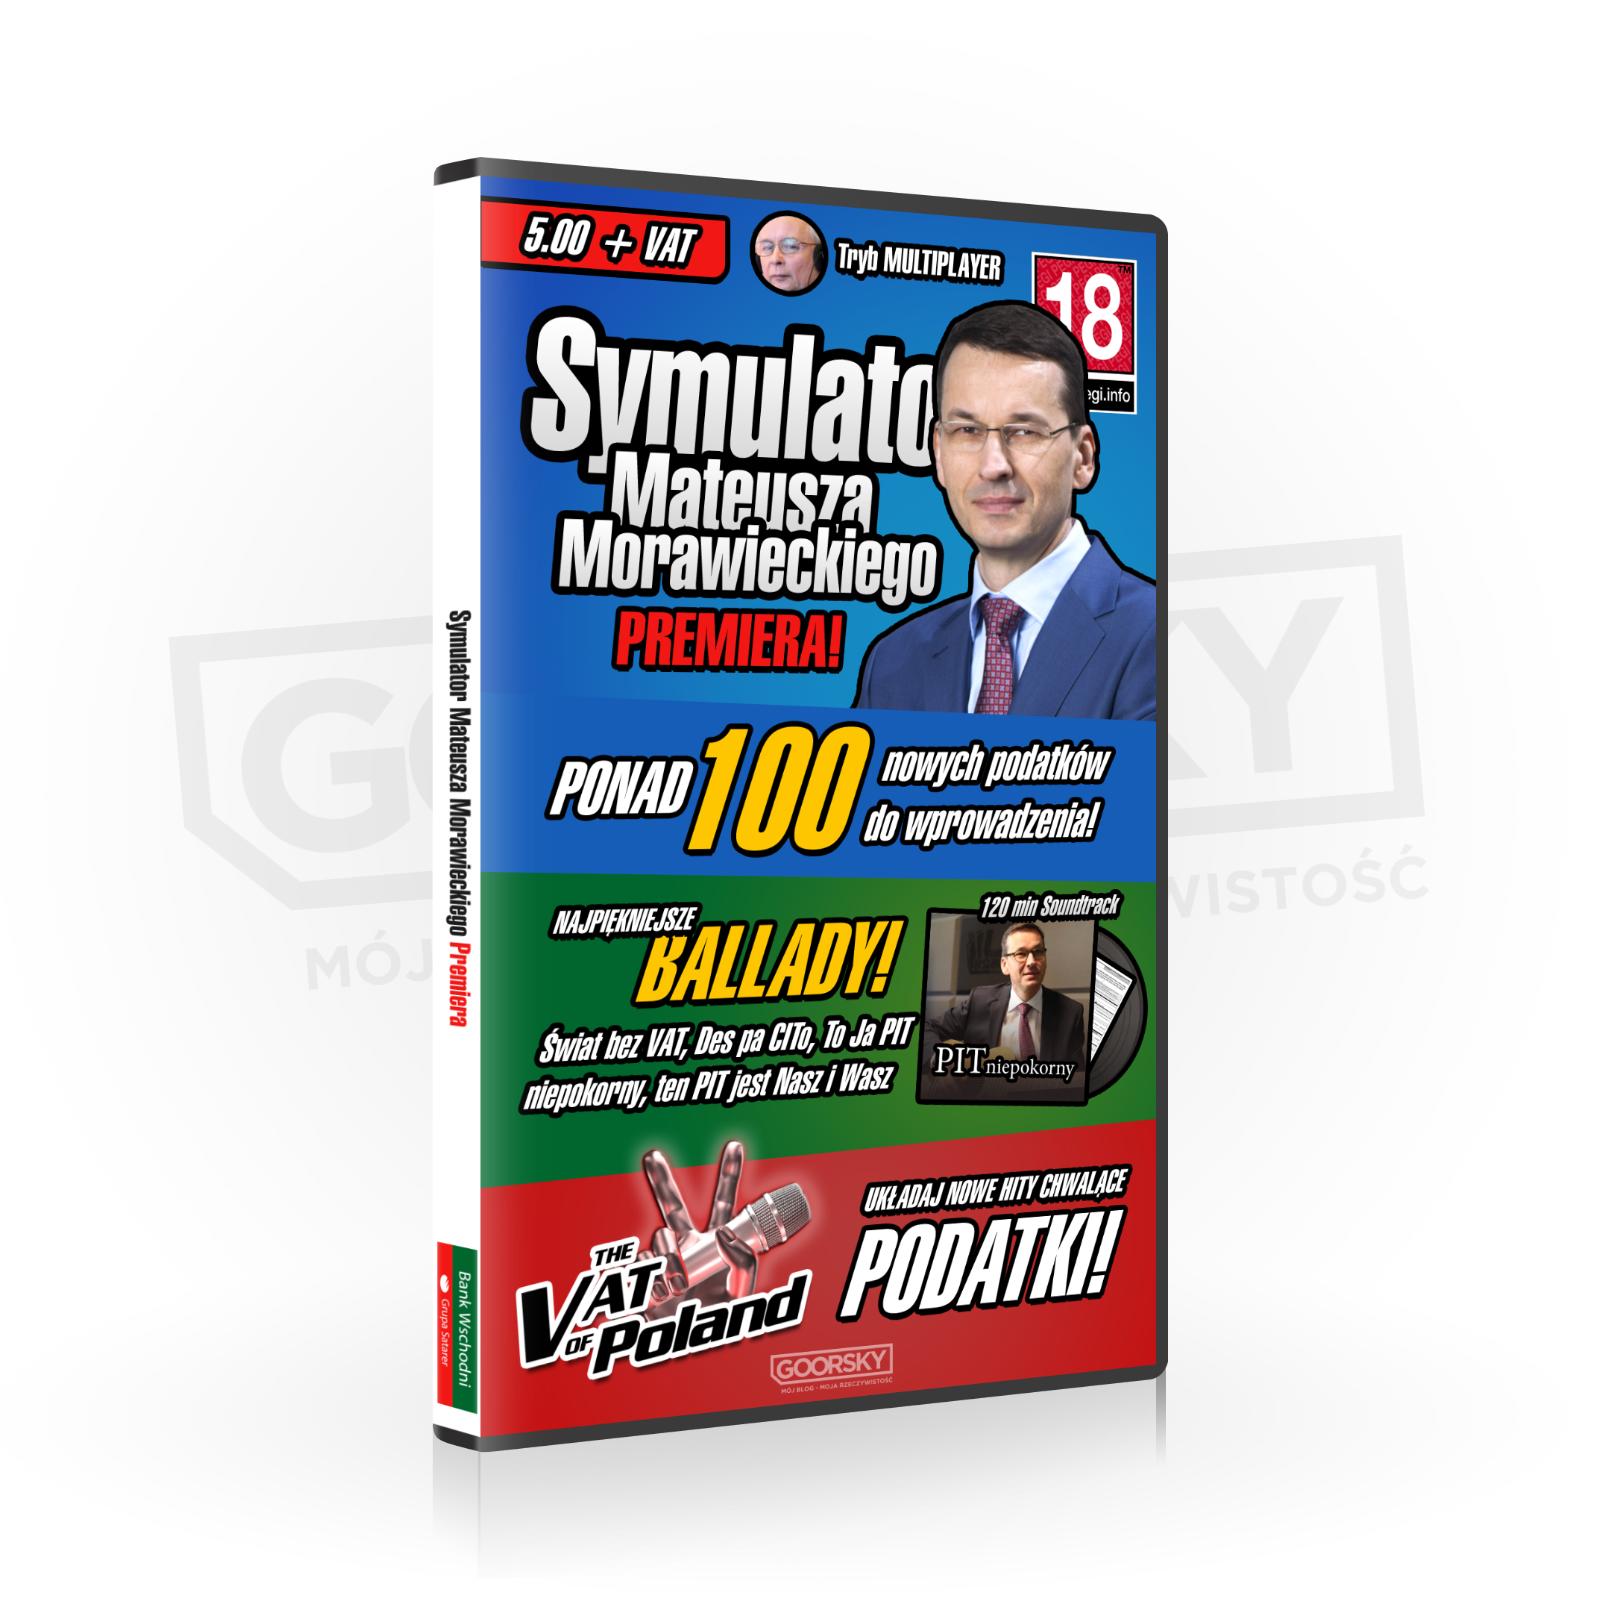 Morawiecki Symulator